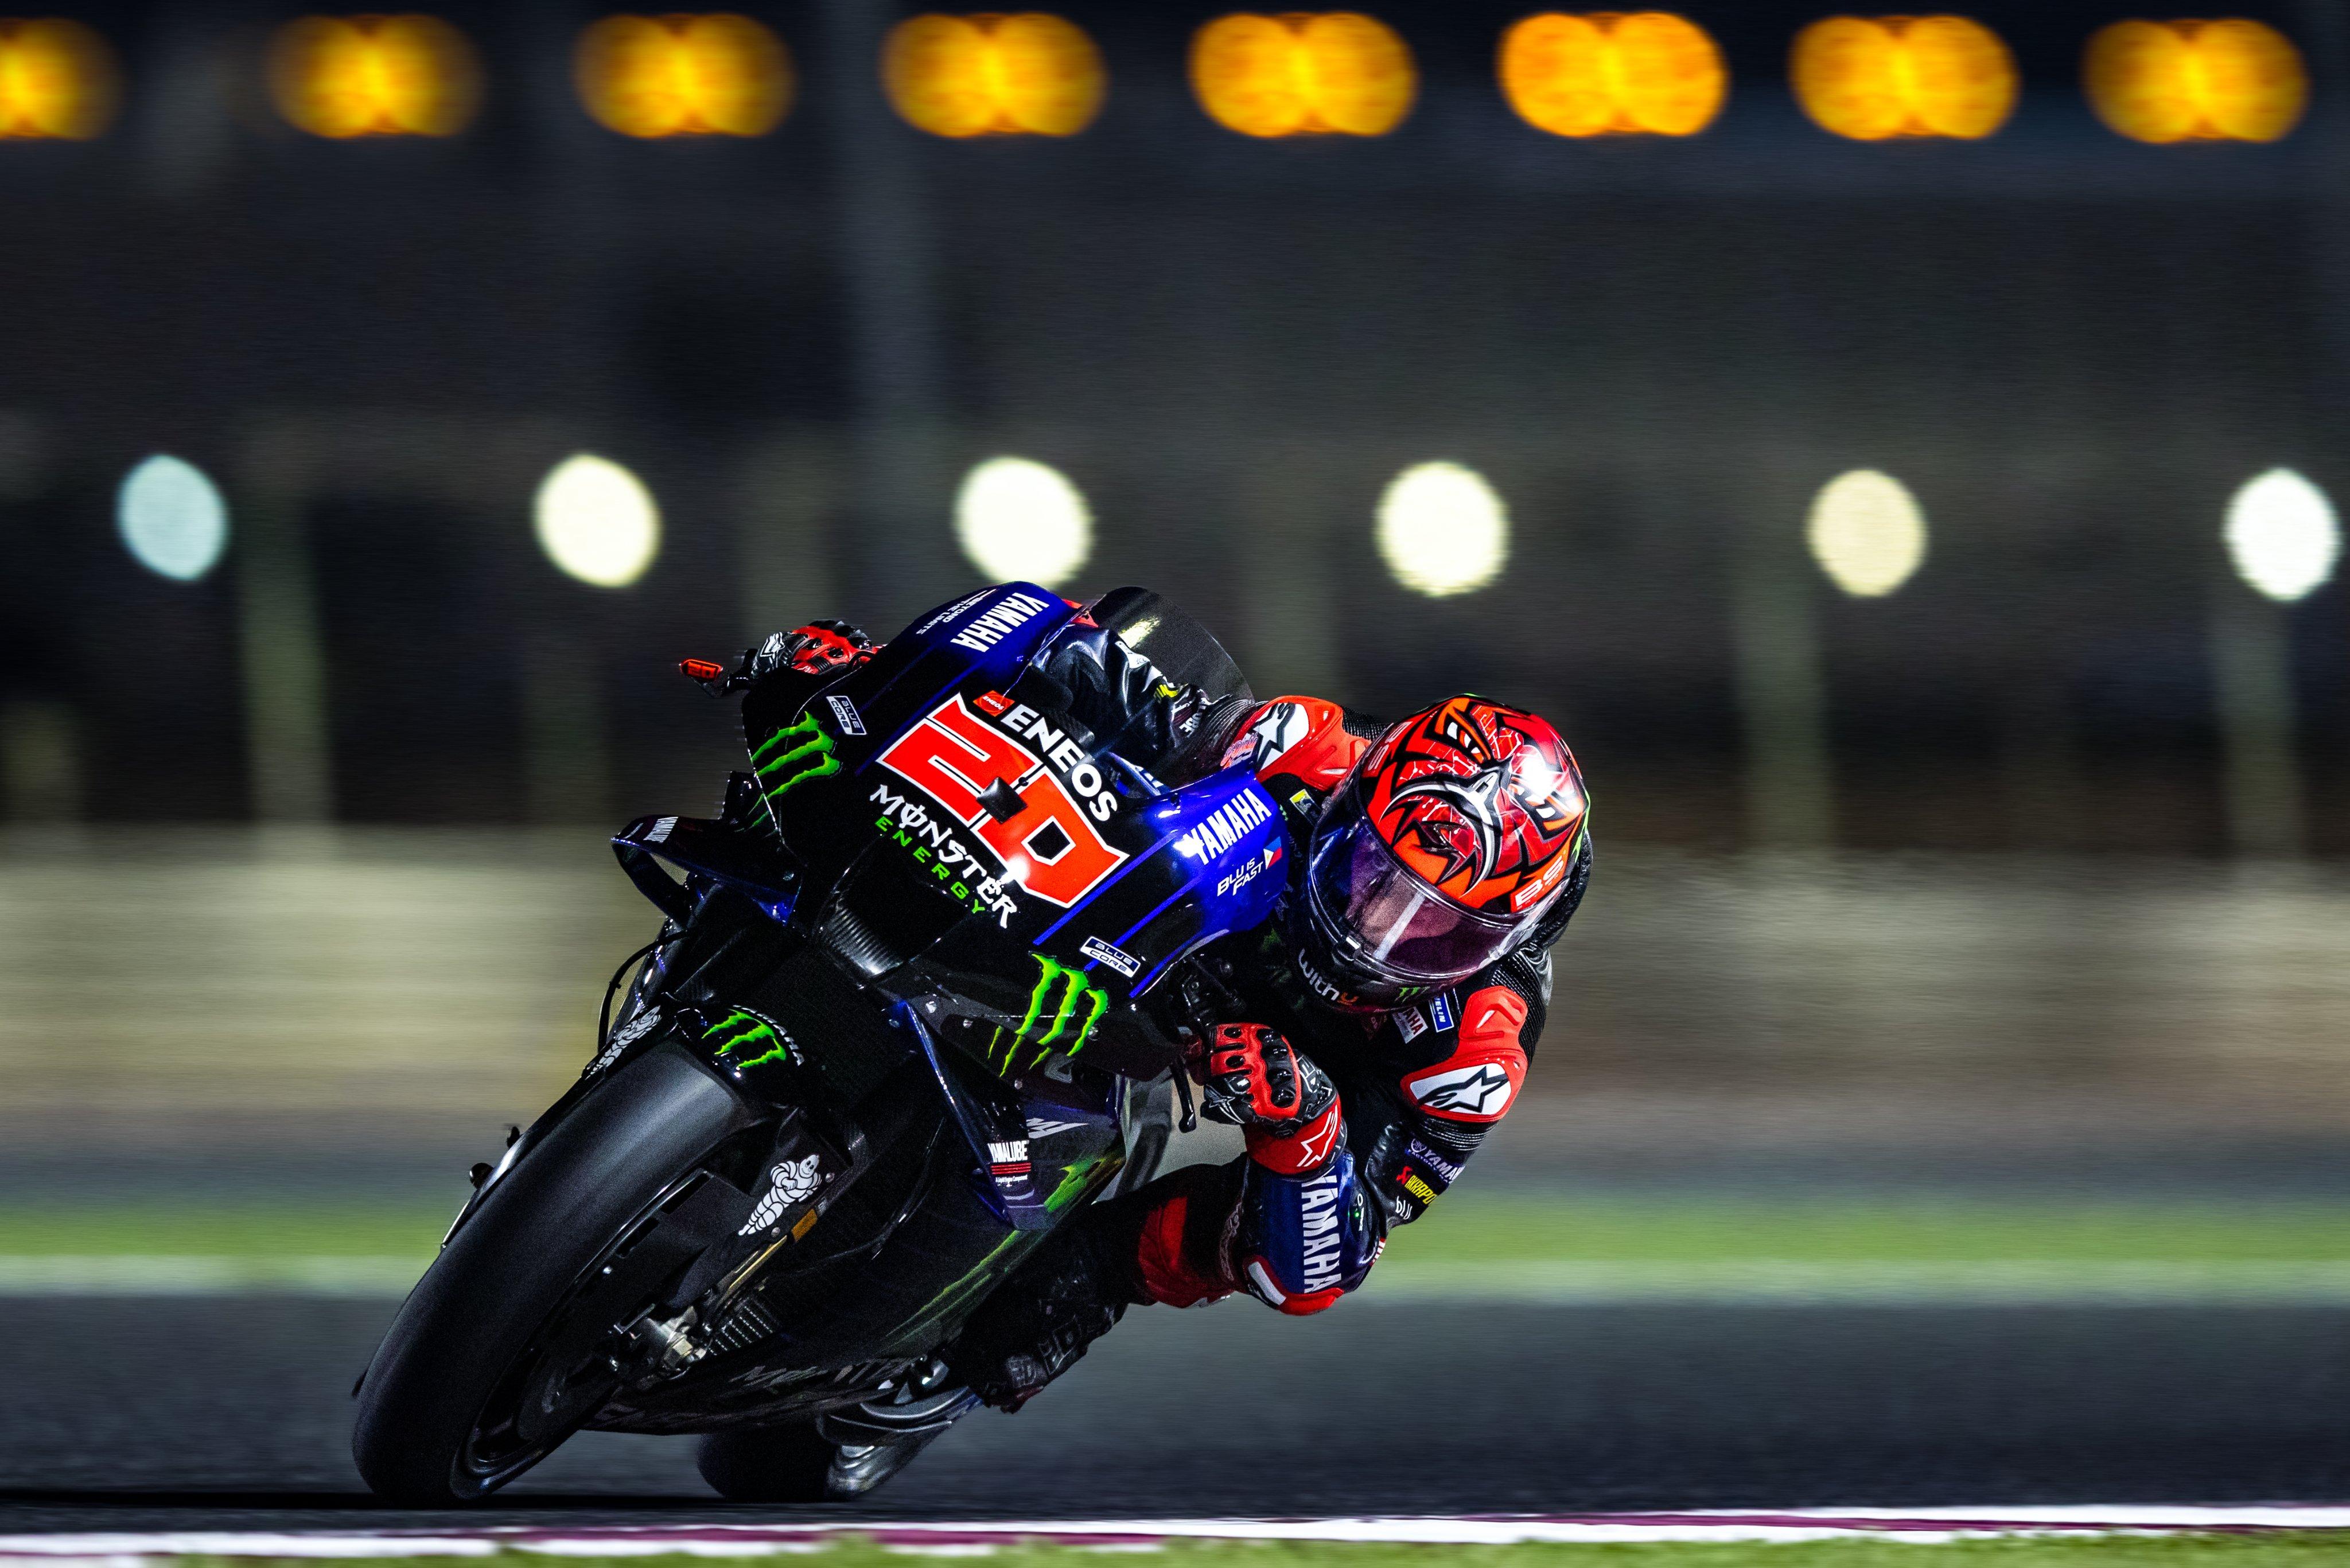 Moto GP 2021 - Page 2 Ev9IwEuXcAEp0_R?format=jpg&name=4096x4096